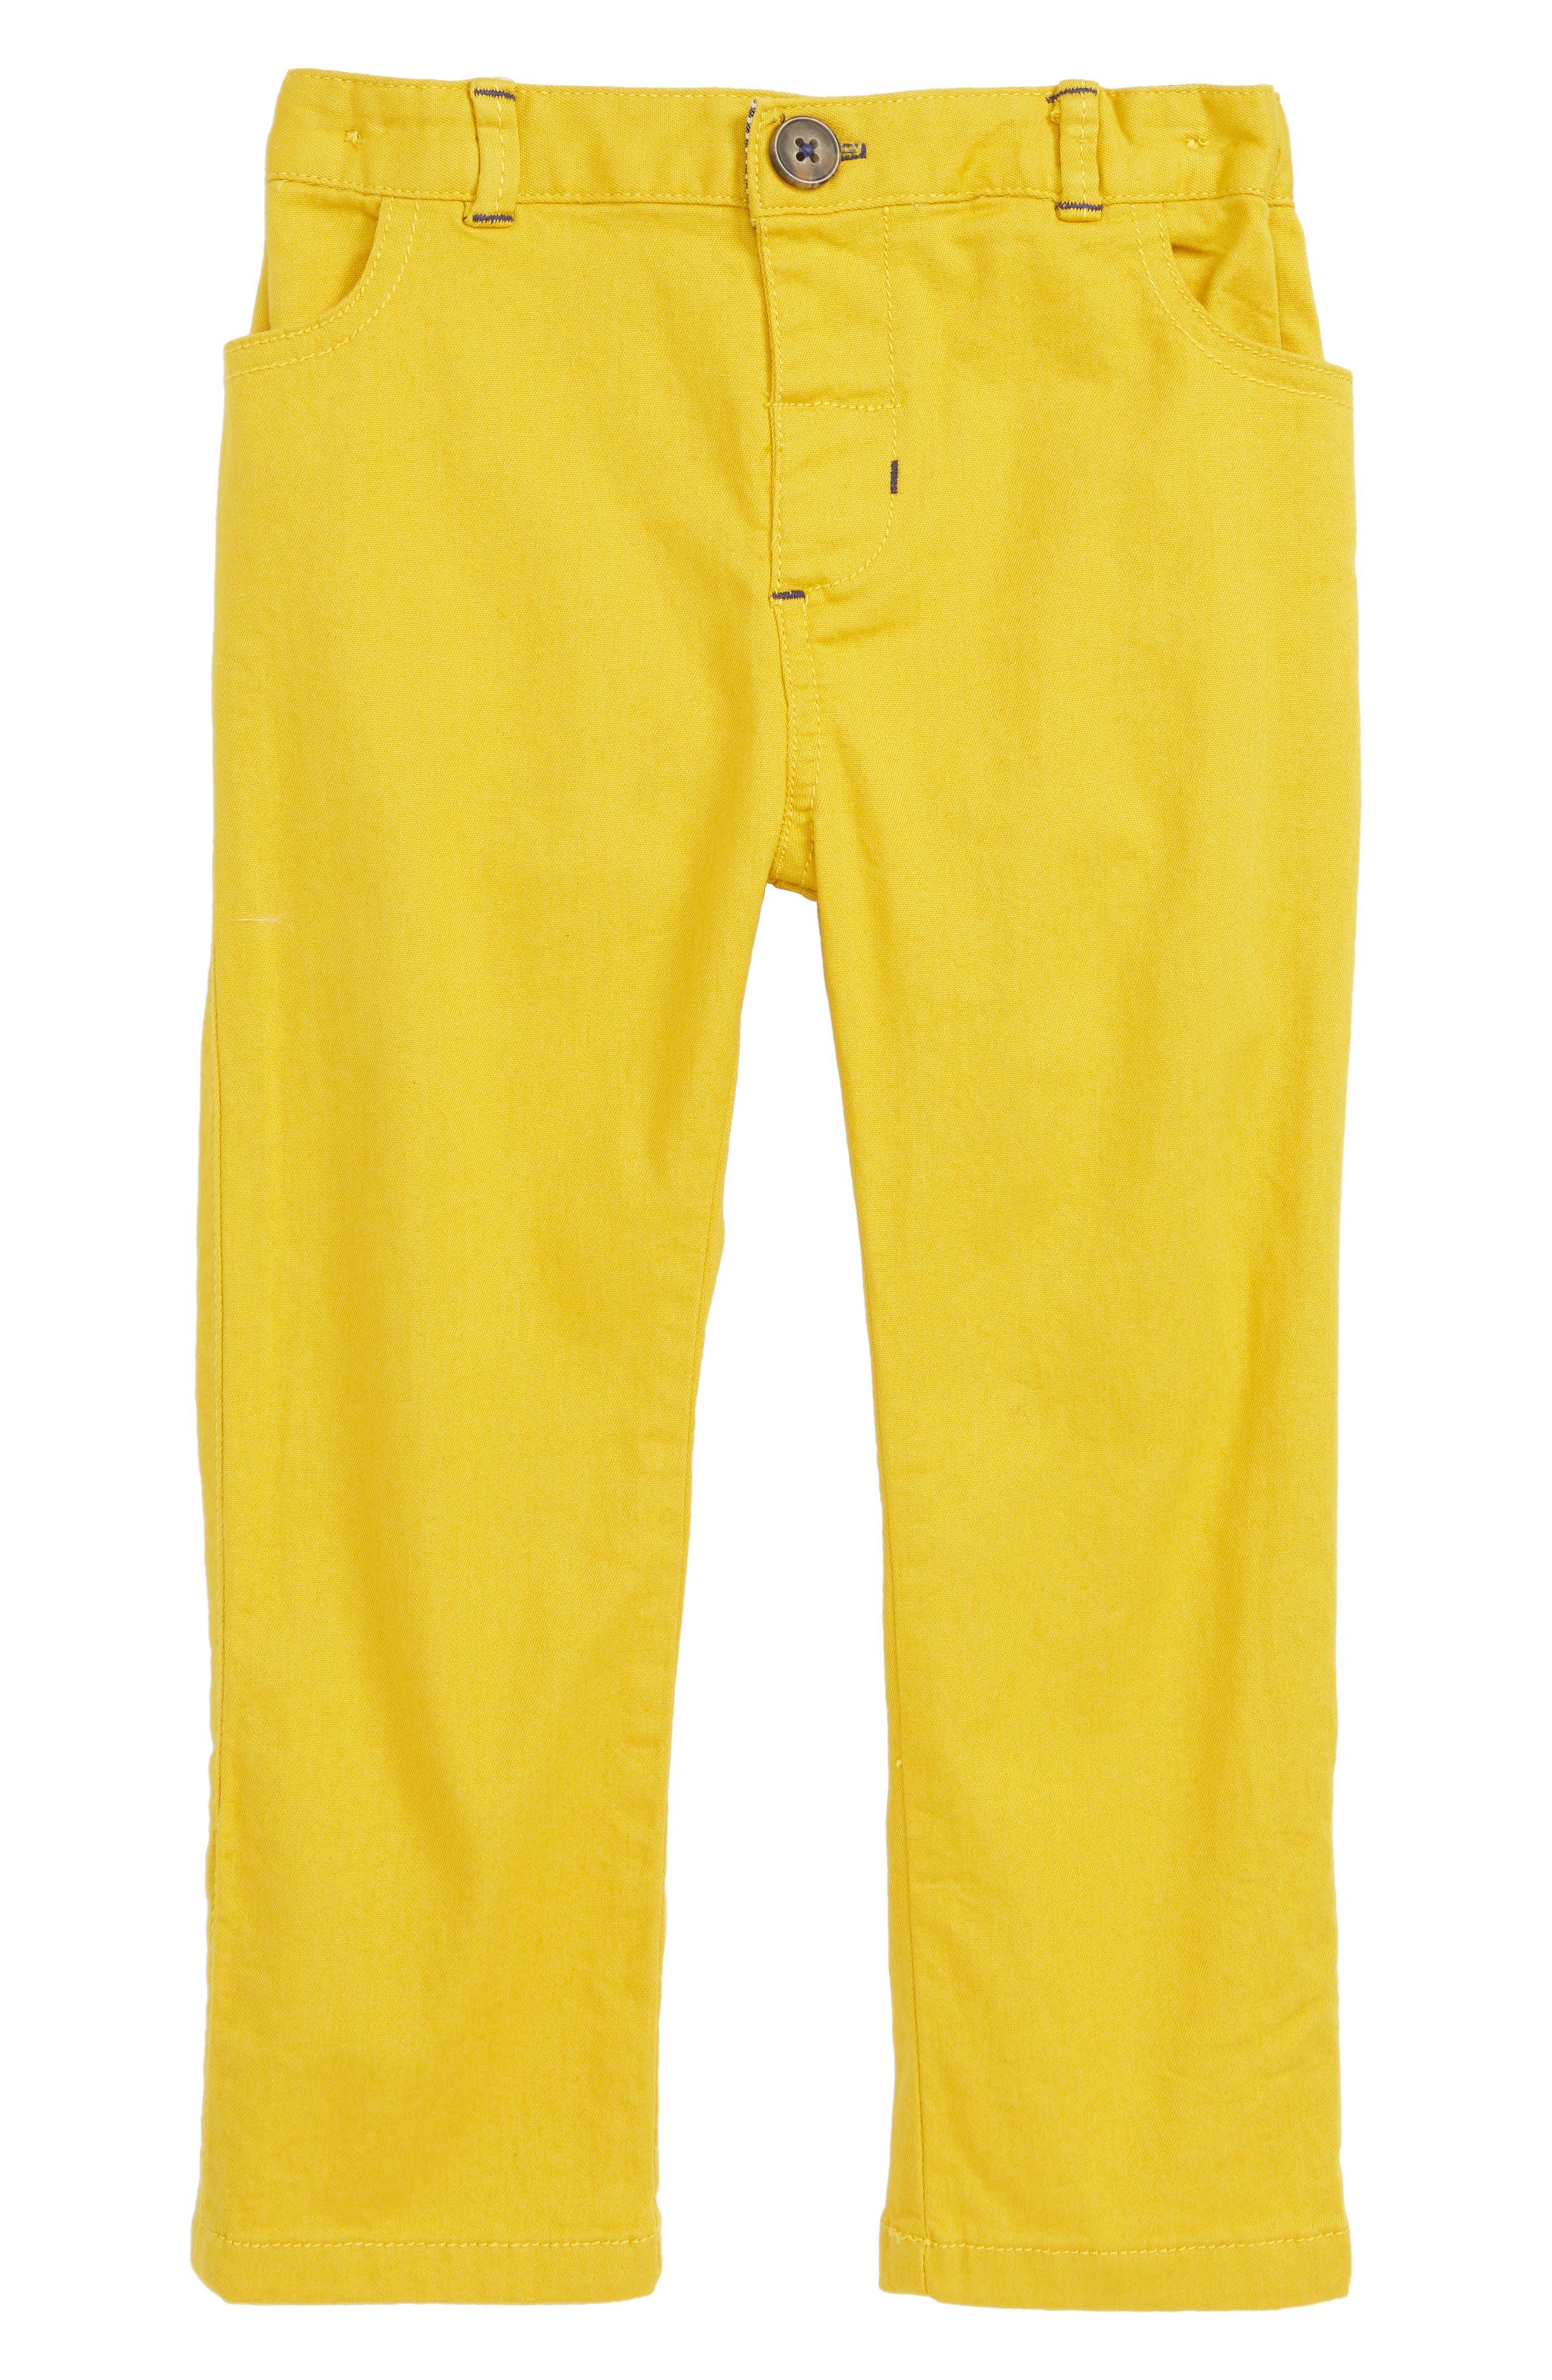 Colorful Chino Pants, Main, color, YEL HONEYCOMB YELLOW